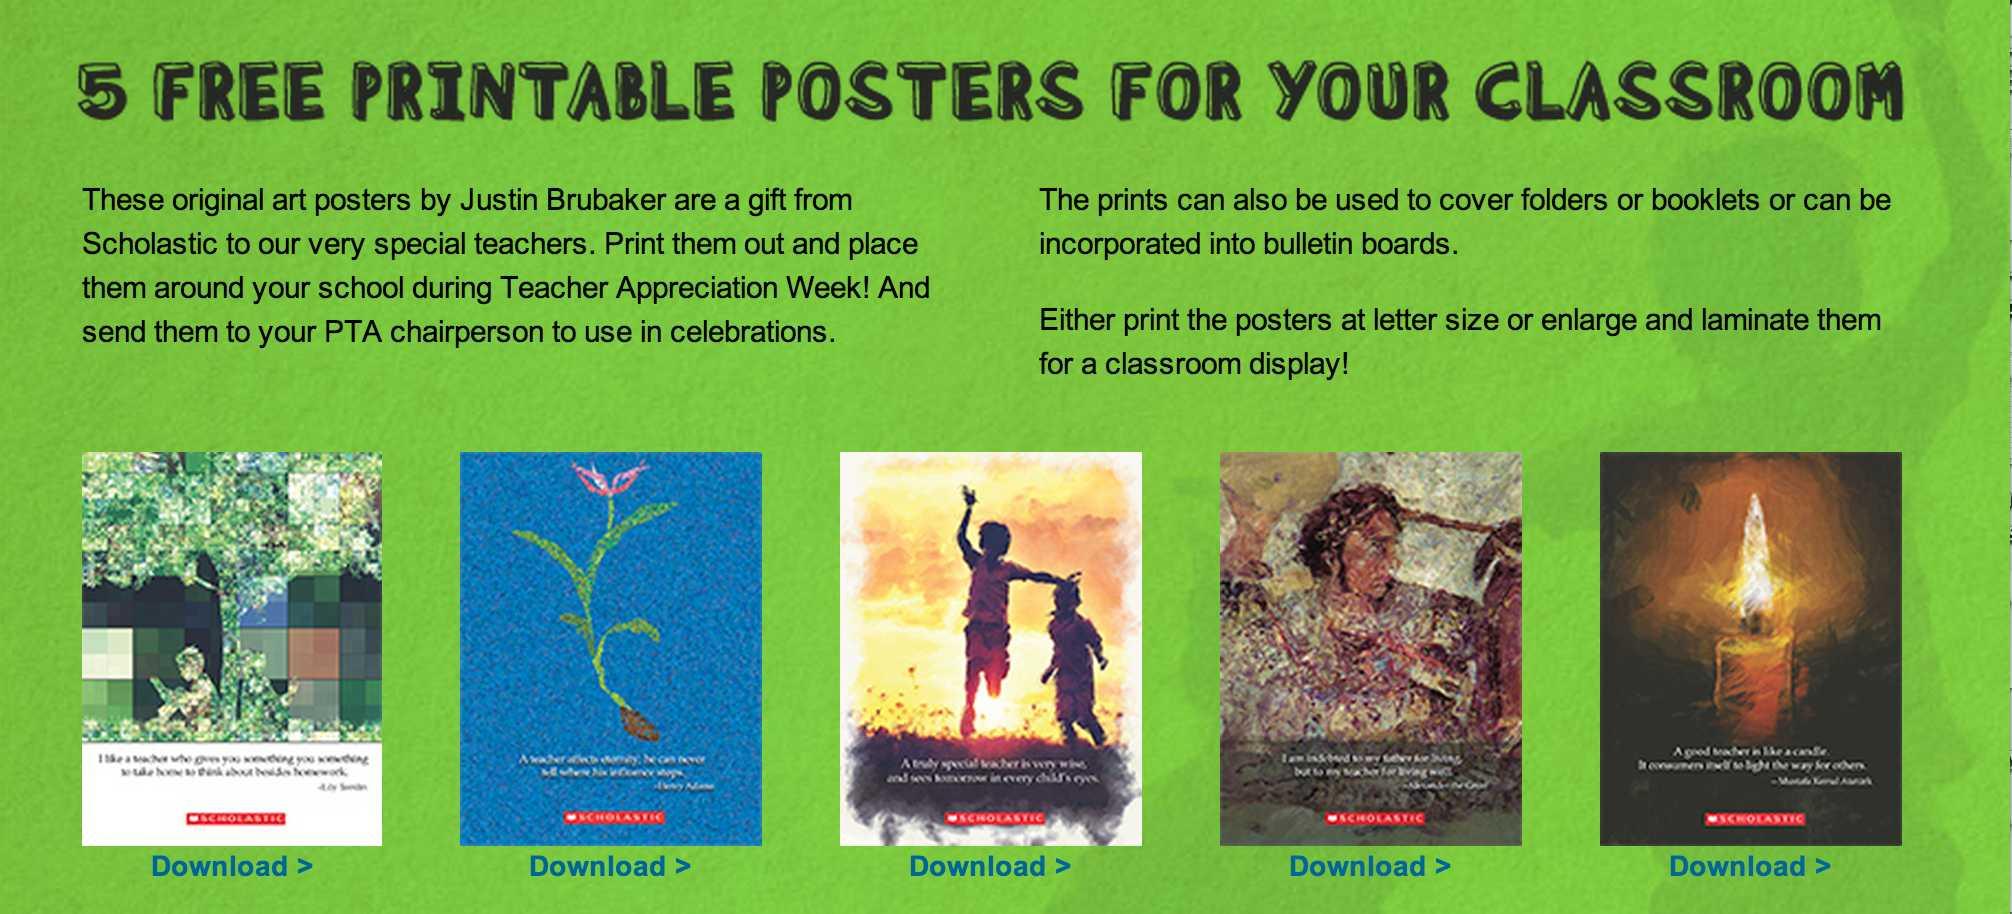 Fabulous Last-Minute, DIY Teacher Appreciation Gifts | Scholastic